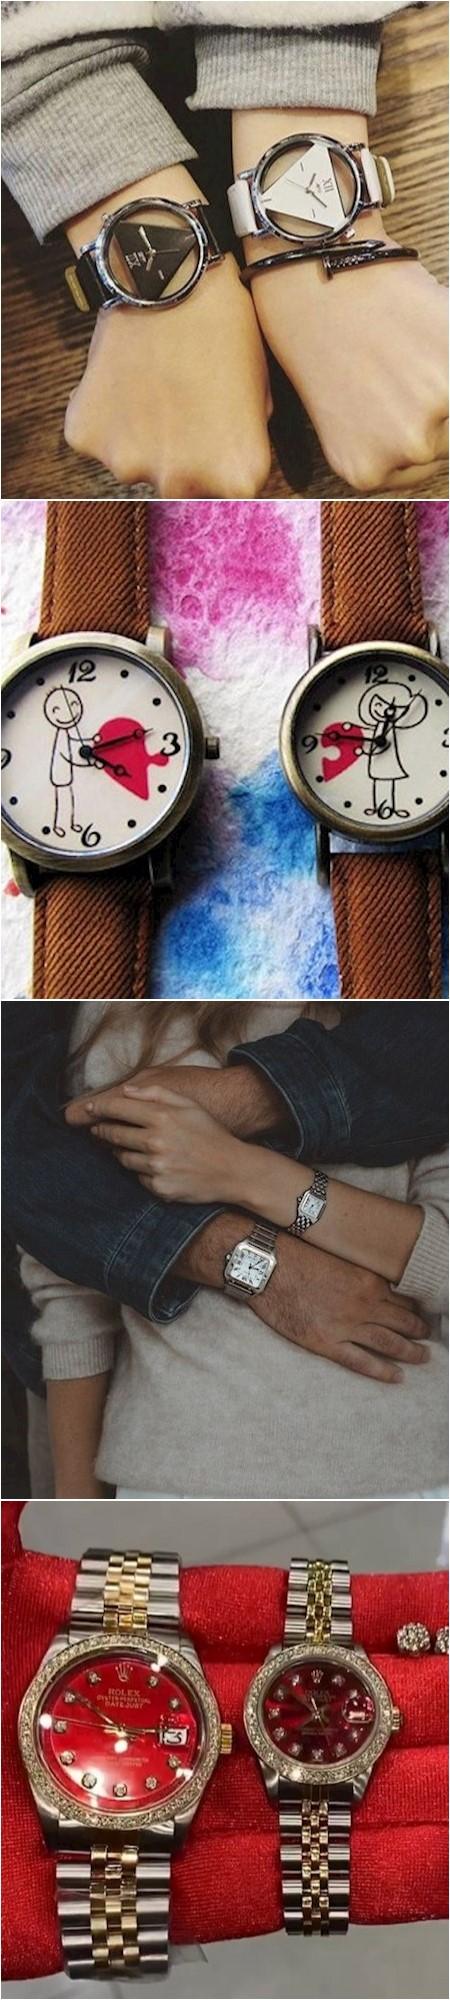 عکس ساعت ست عاشقانه, ست ساعت اسپرت مردانه, ساعت ست اصل